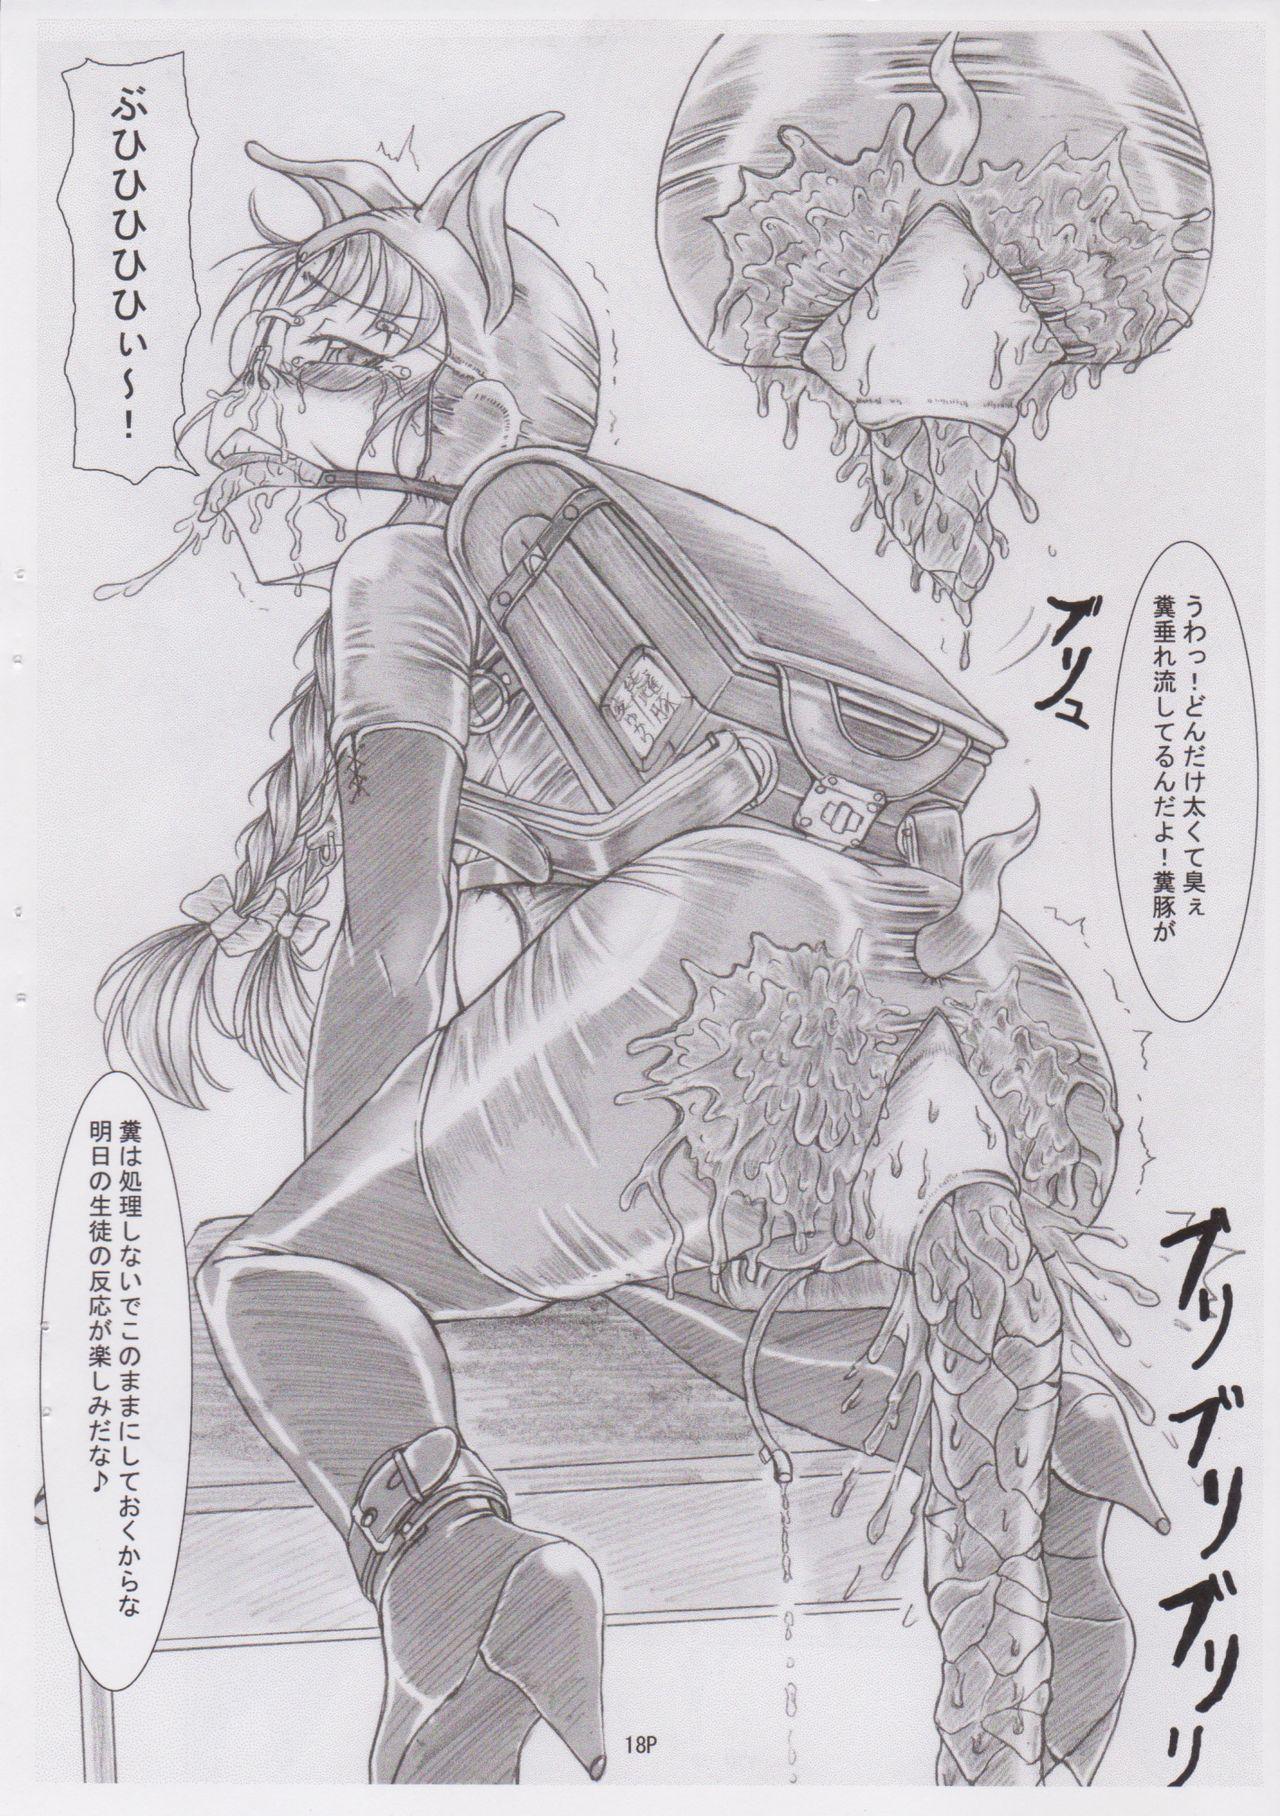 (C78) [Nekoneko Panchu! (Nekoneko Panchu)] Sanshimai Choukyou Yuugi [Yukari Hen] Yukari-chan no Butabana Kachiku Choukyou [Anal Higyaku Jugyou] 17